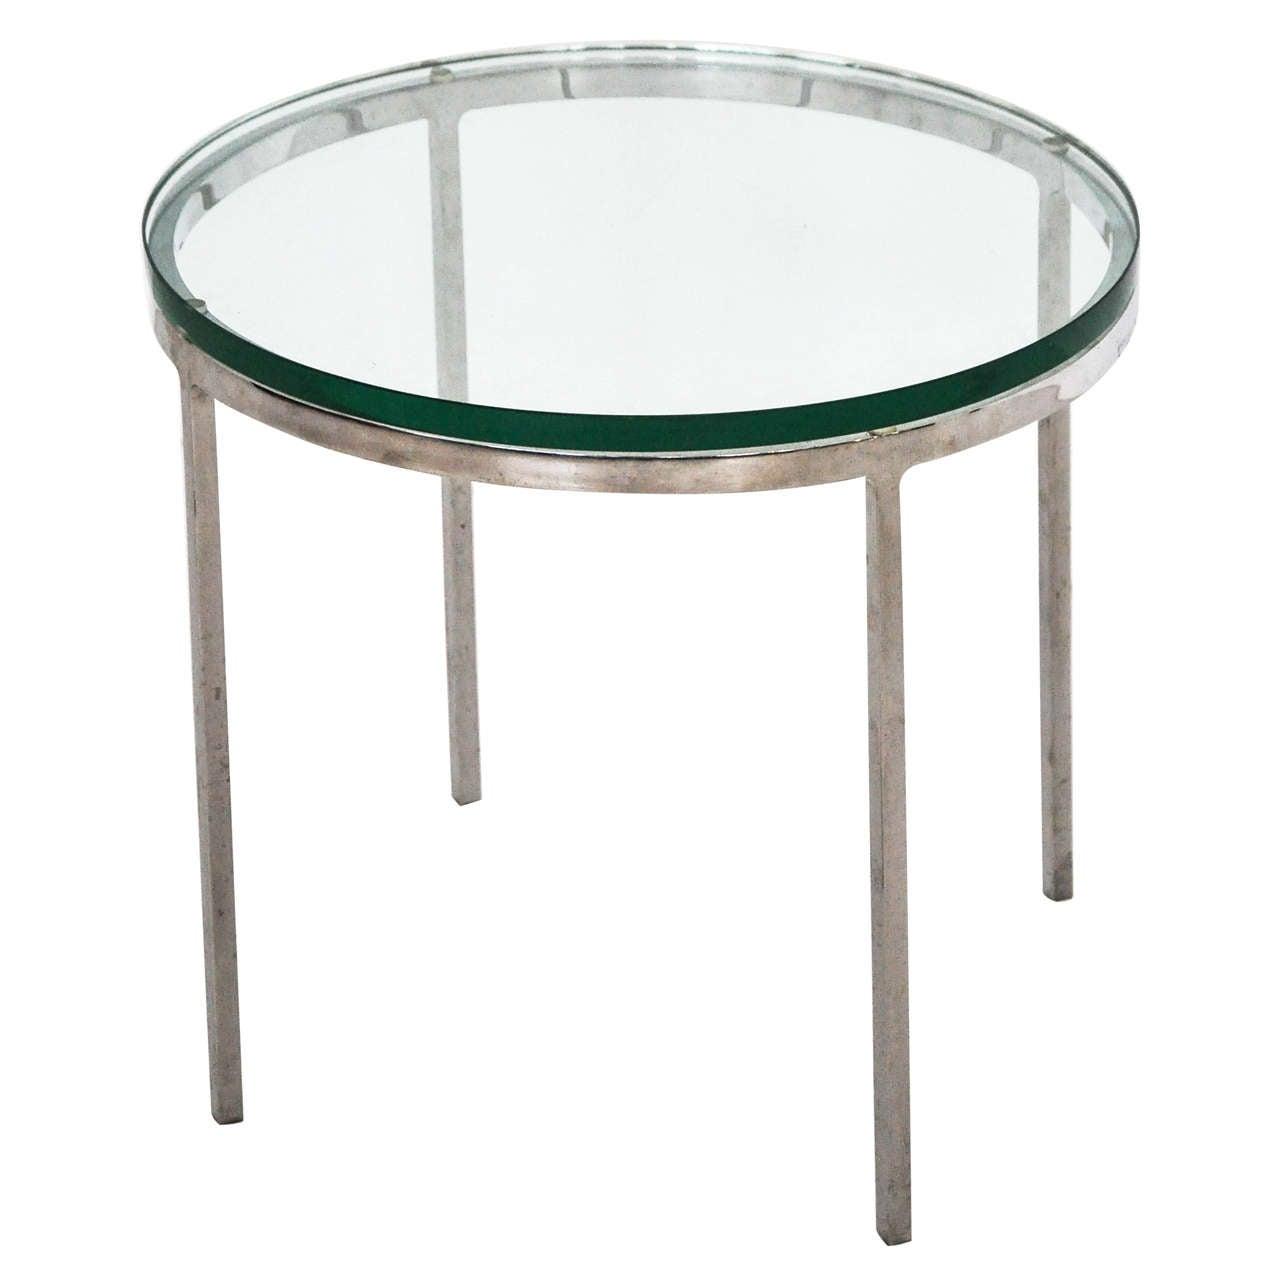 nicos zographos chrome and glass side table at 1stdibs